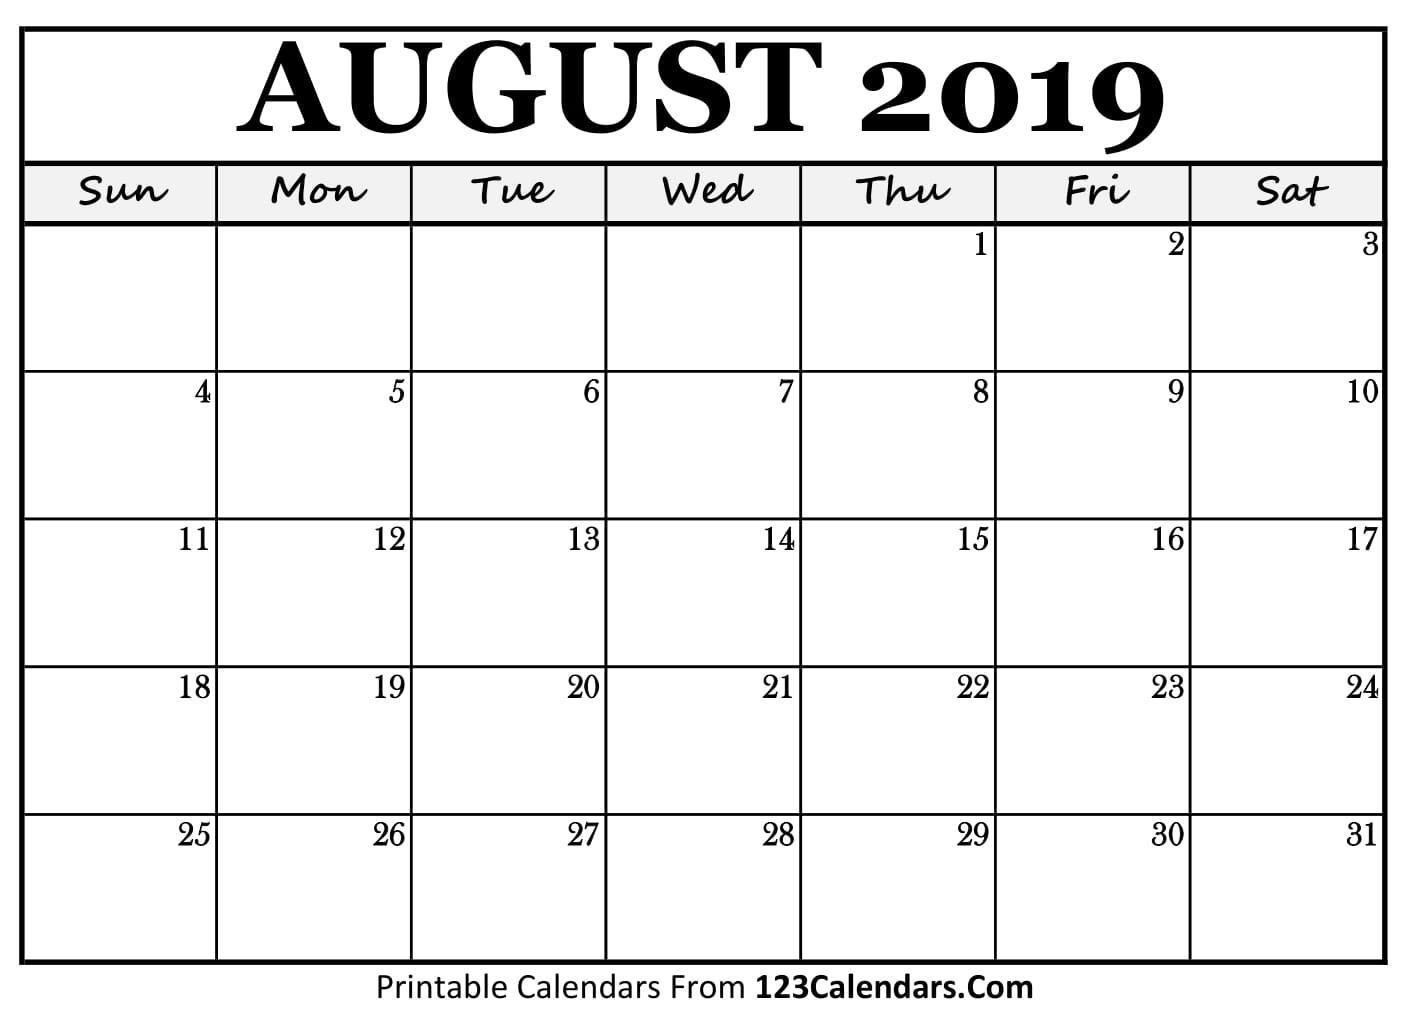 August 2019 Printable Calendar | 123Calendars inside Blank Printable Calendar August